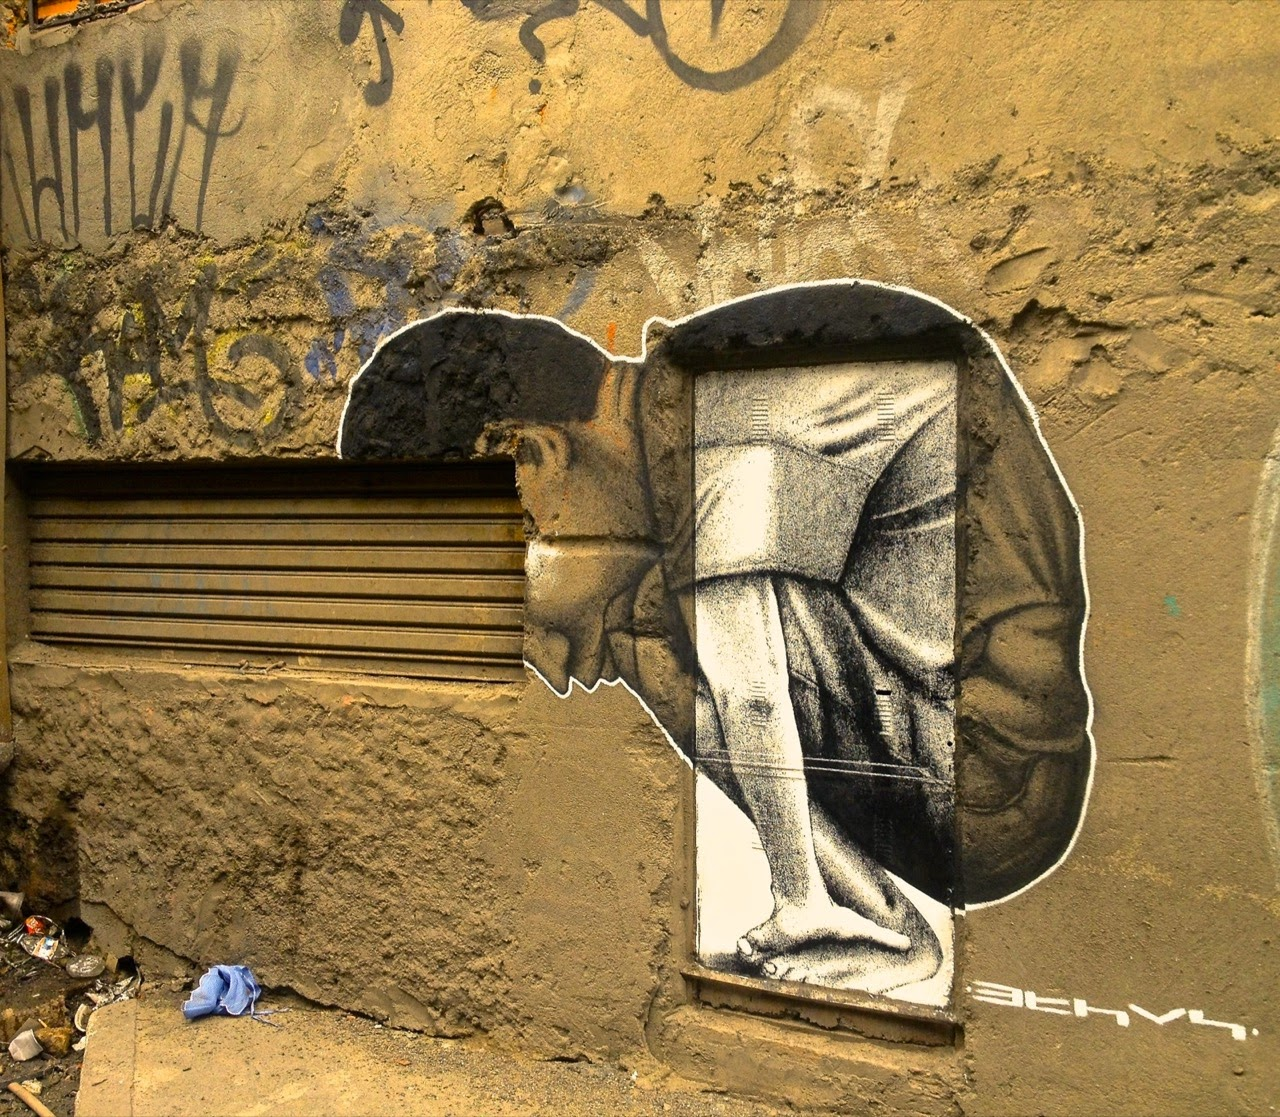 claudio-ethos-new-murals-in-sao-paulo-brazil-04